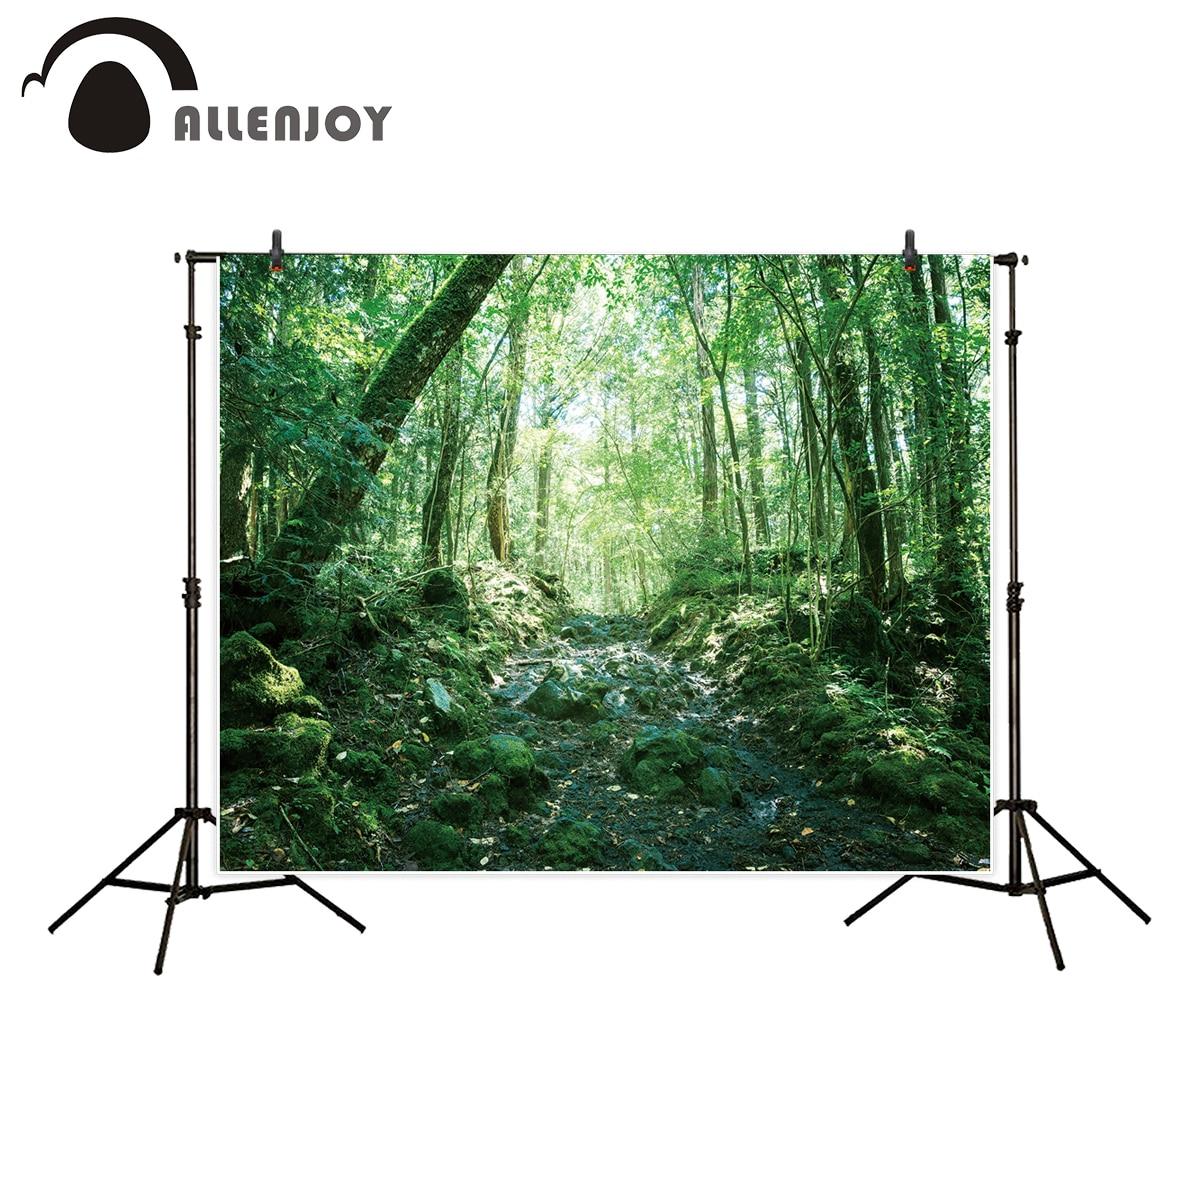 Allenjoy profissional fotografia fundo rochoso estrada floresta profunda verde primavera temporada pano de fundo photo studio photocall